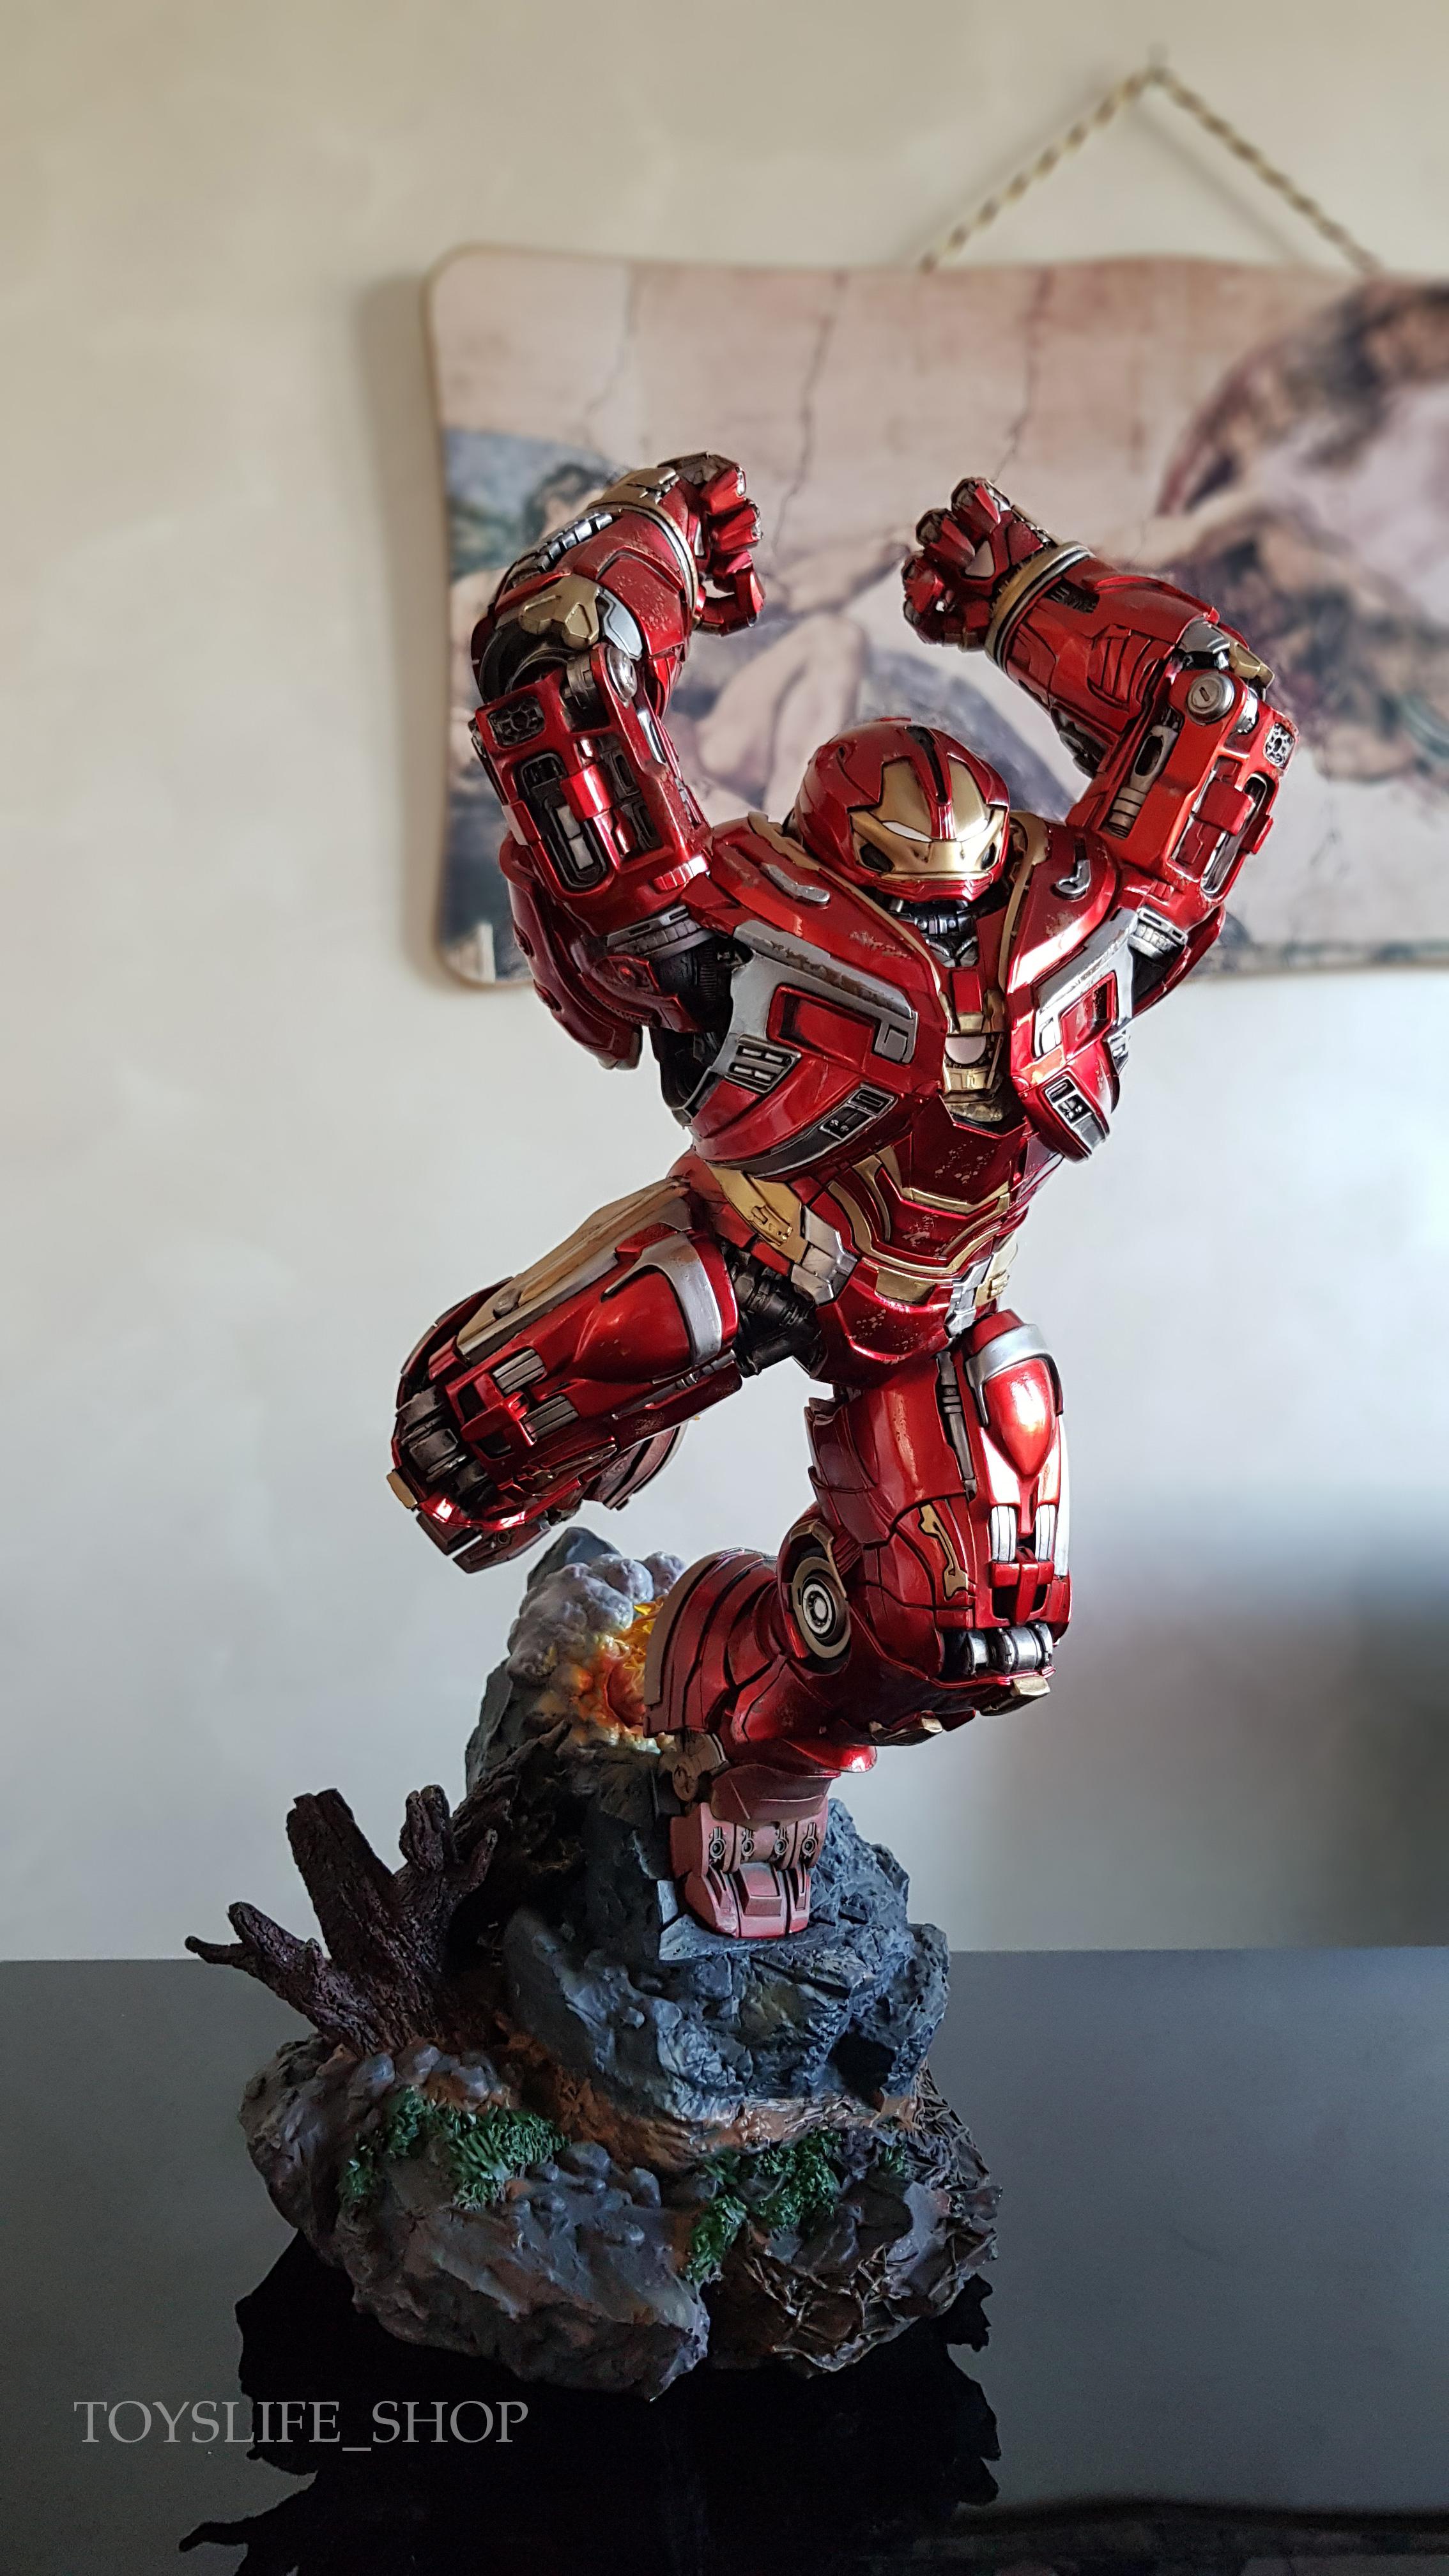 iron-studios-avengers-infinity-war-hulkbuster-1:10-statue-review-toyslife-02